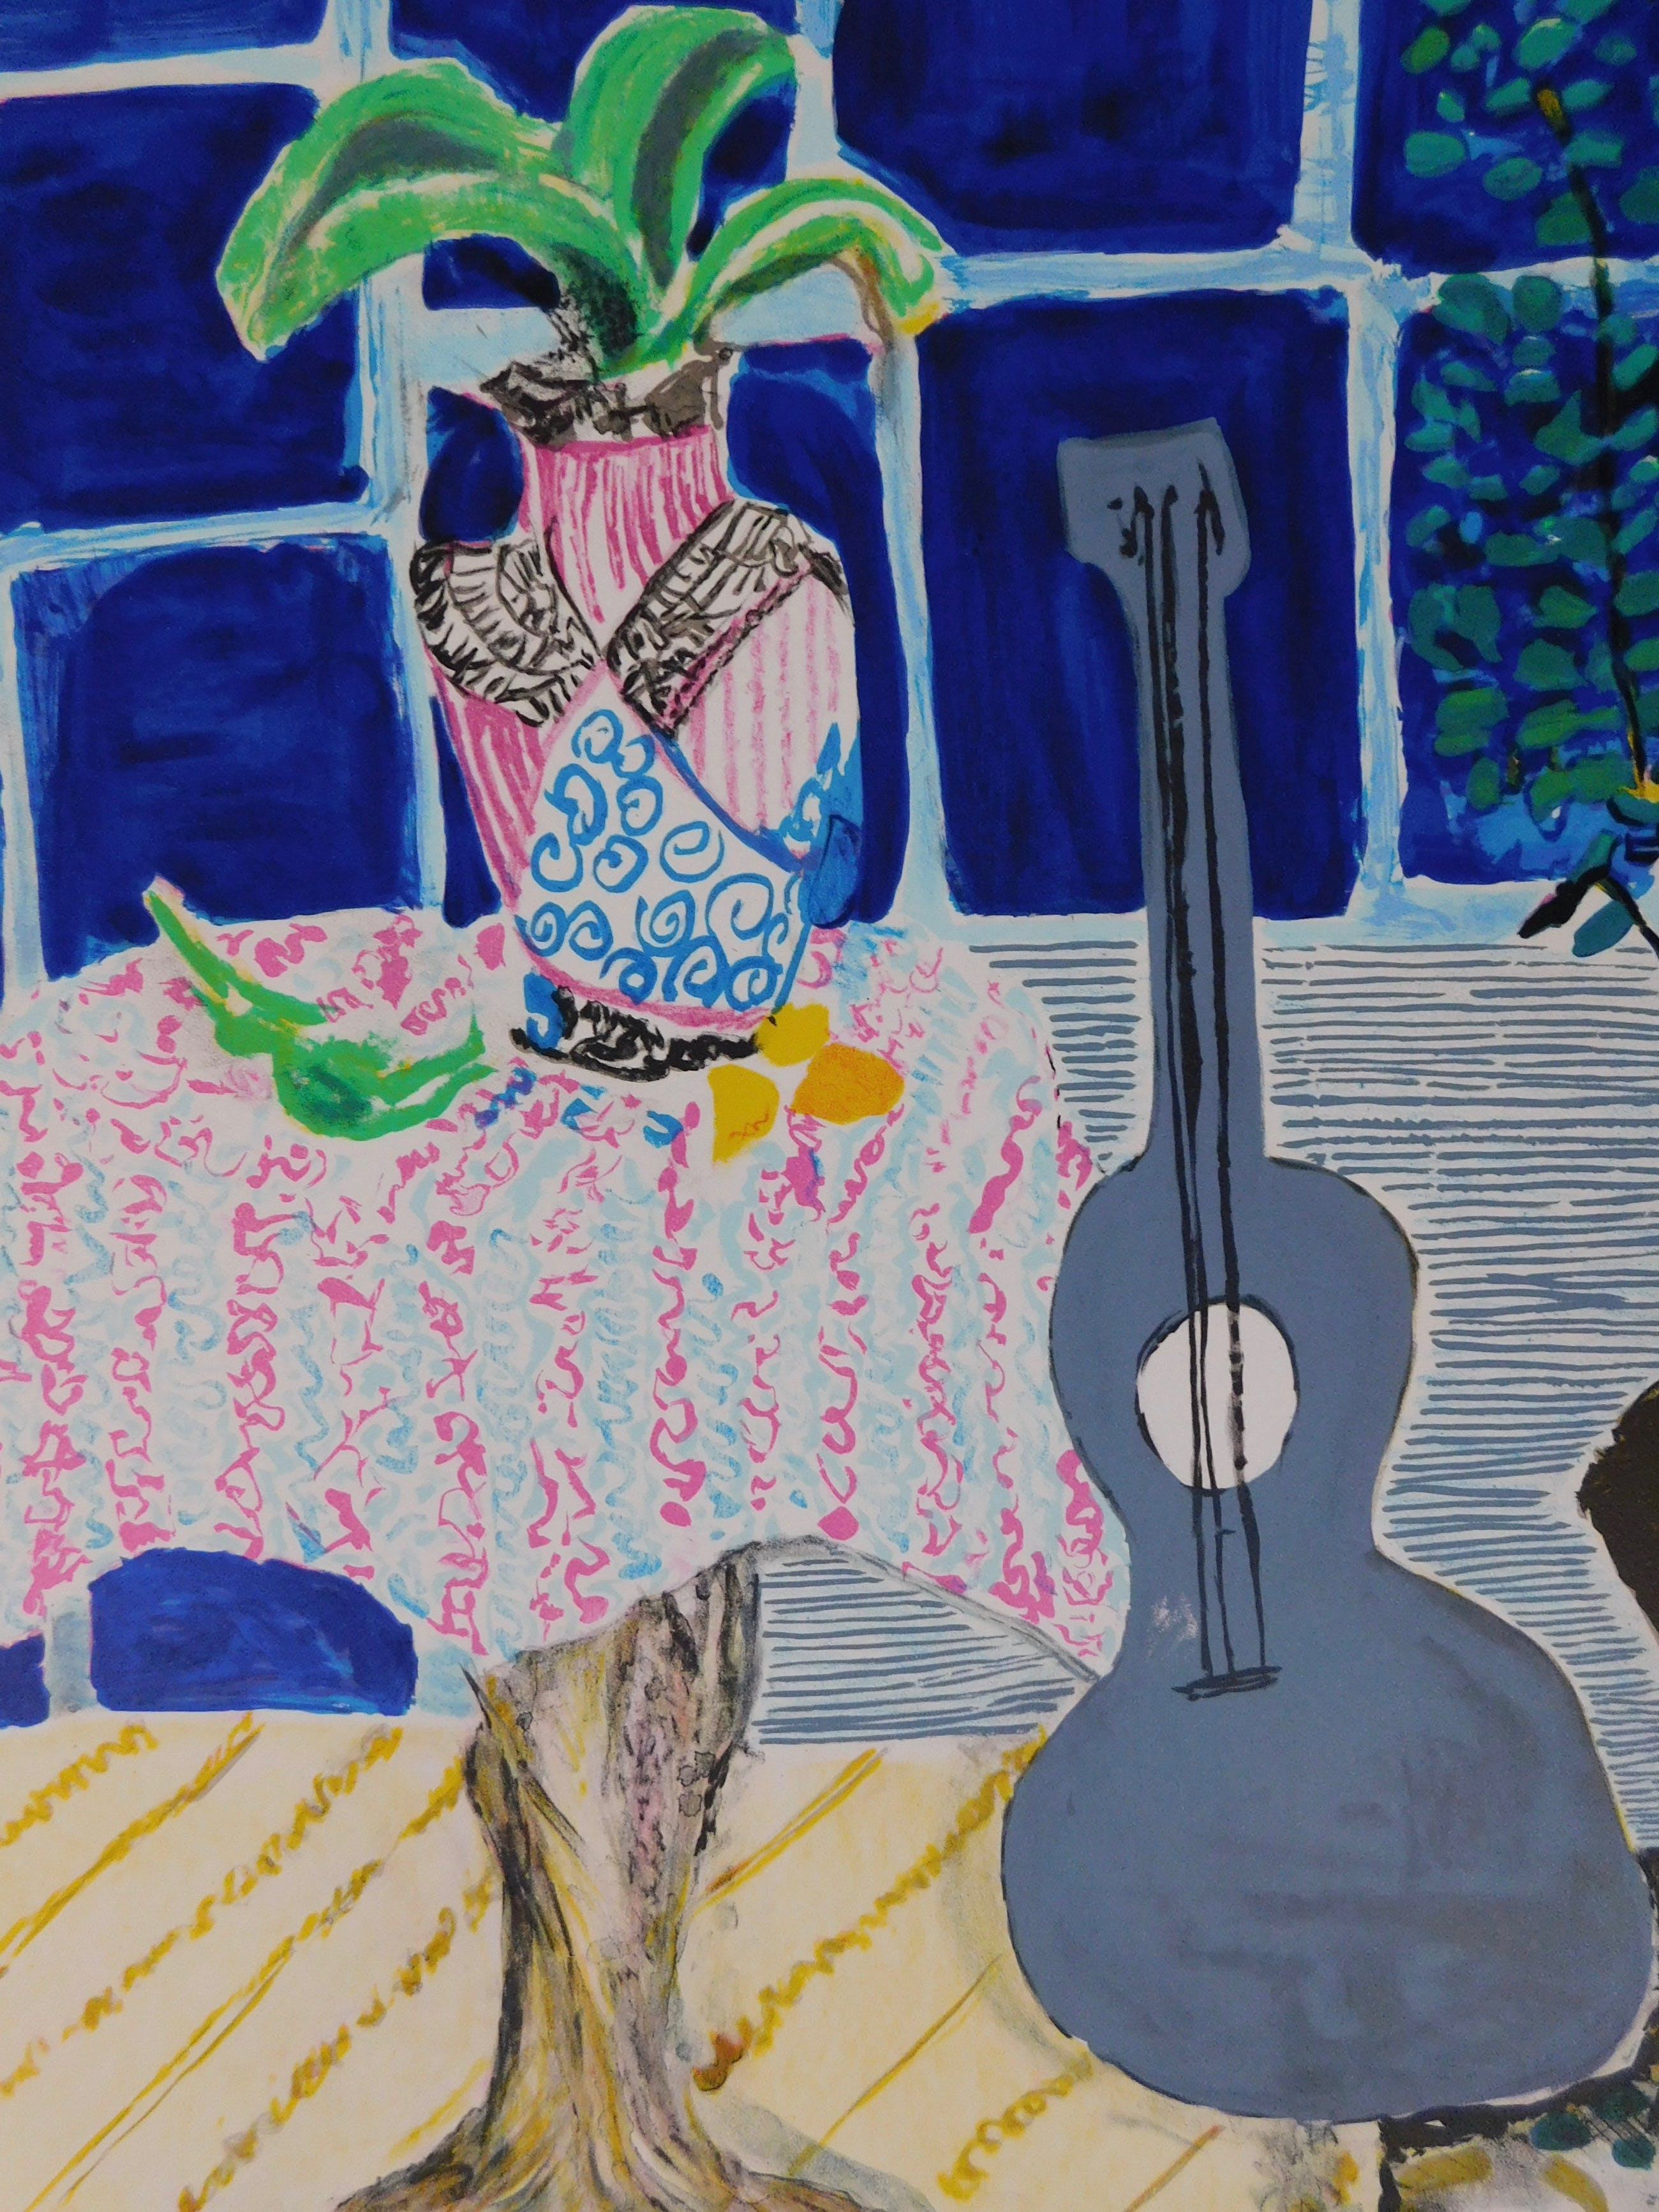 Wendy Chazin - Composition with Guitar and Vase kopen? Bied vanaf 25!